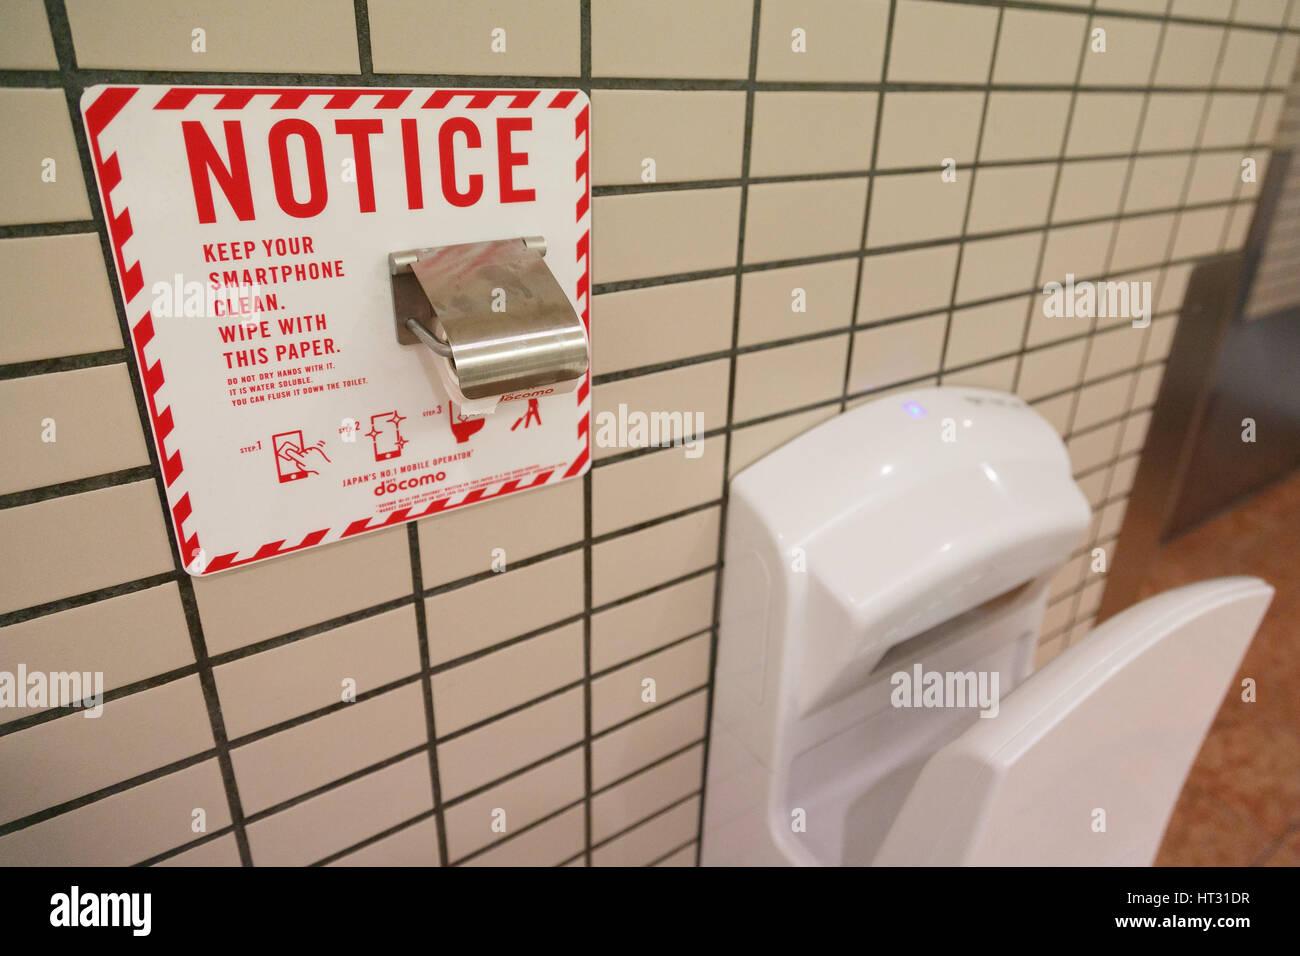 Toilet Instructions Stock Photos & Toilet Instructions Stock